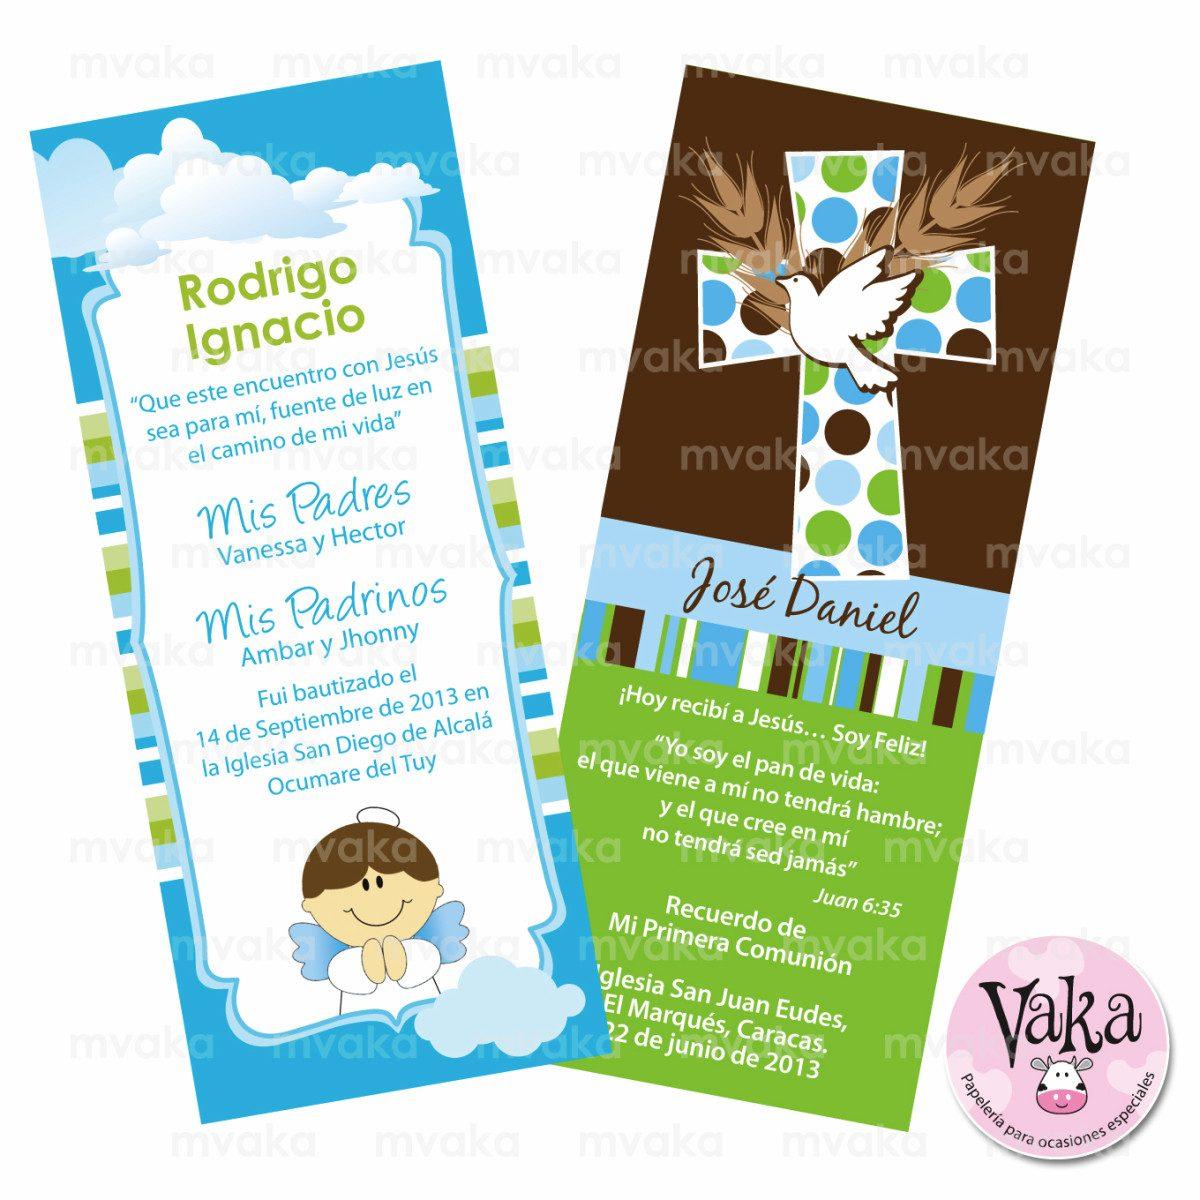 Dise os de tarjetas para recuerdos de bautizo imagui for Disenos para tarjetas